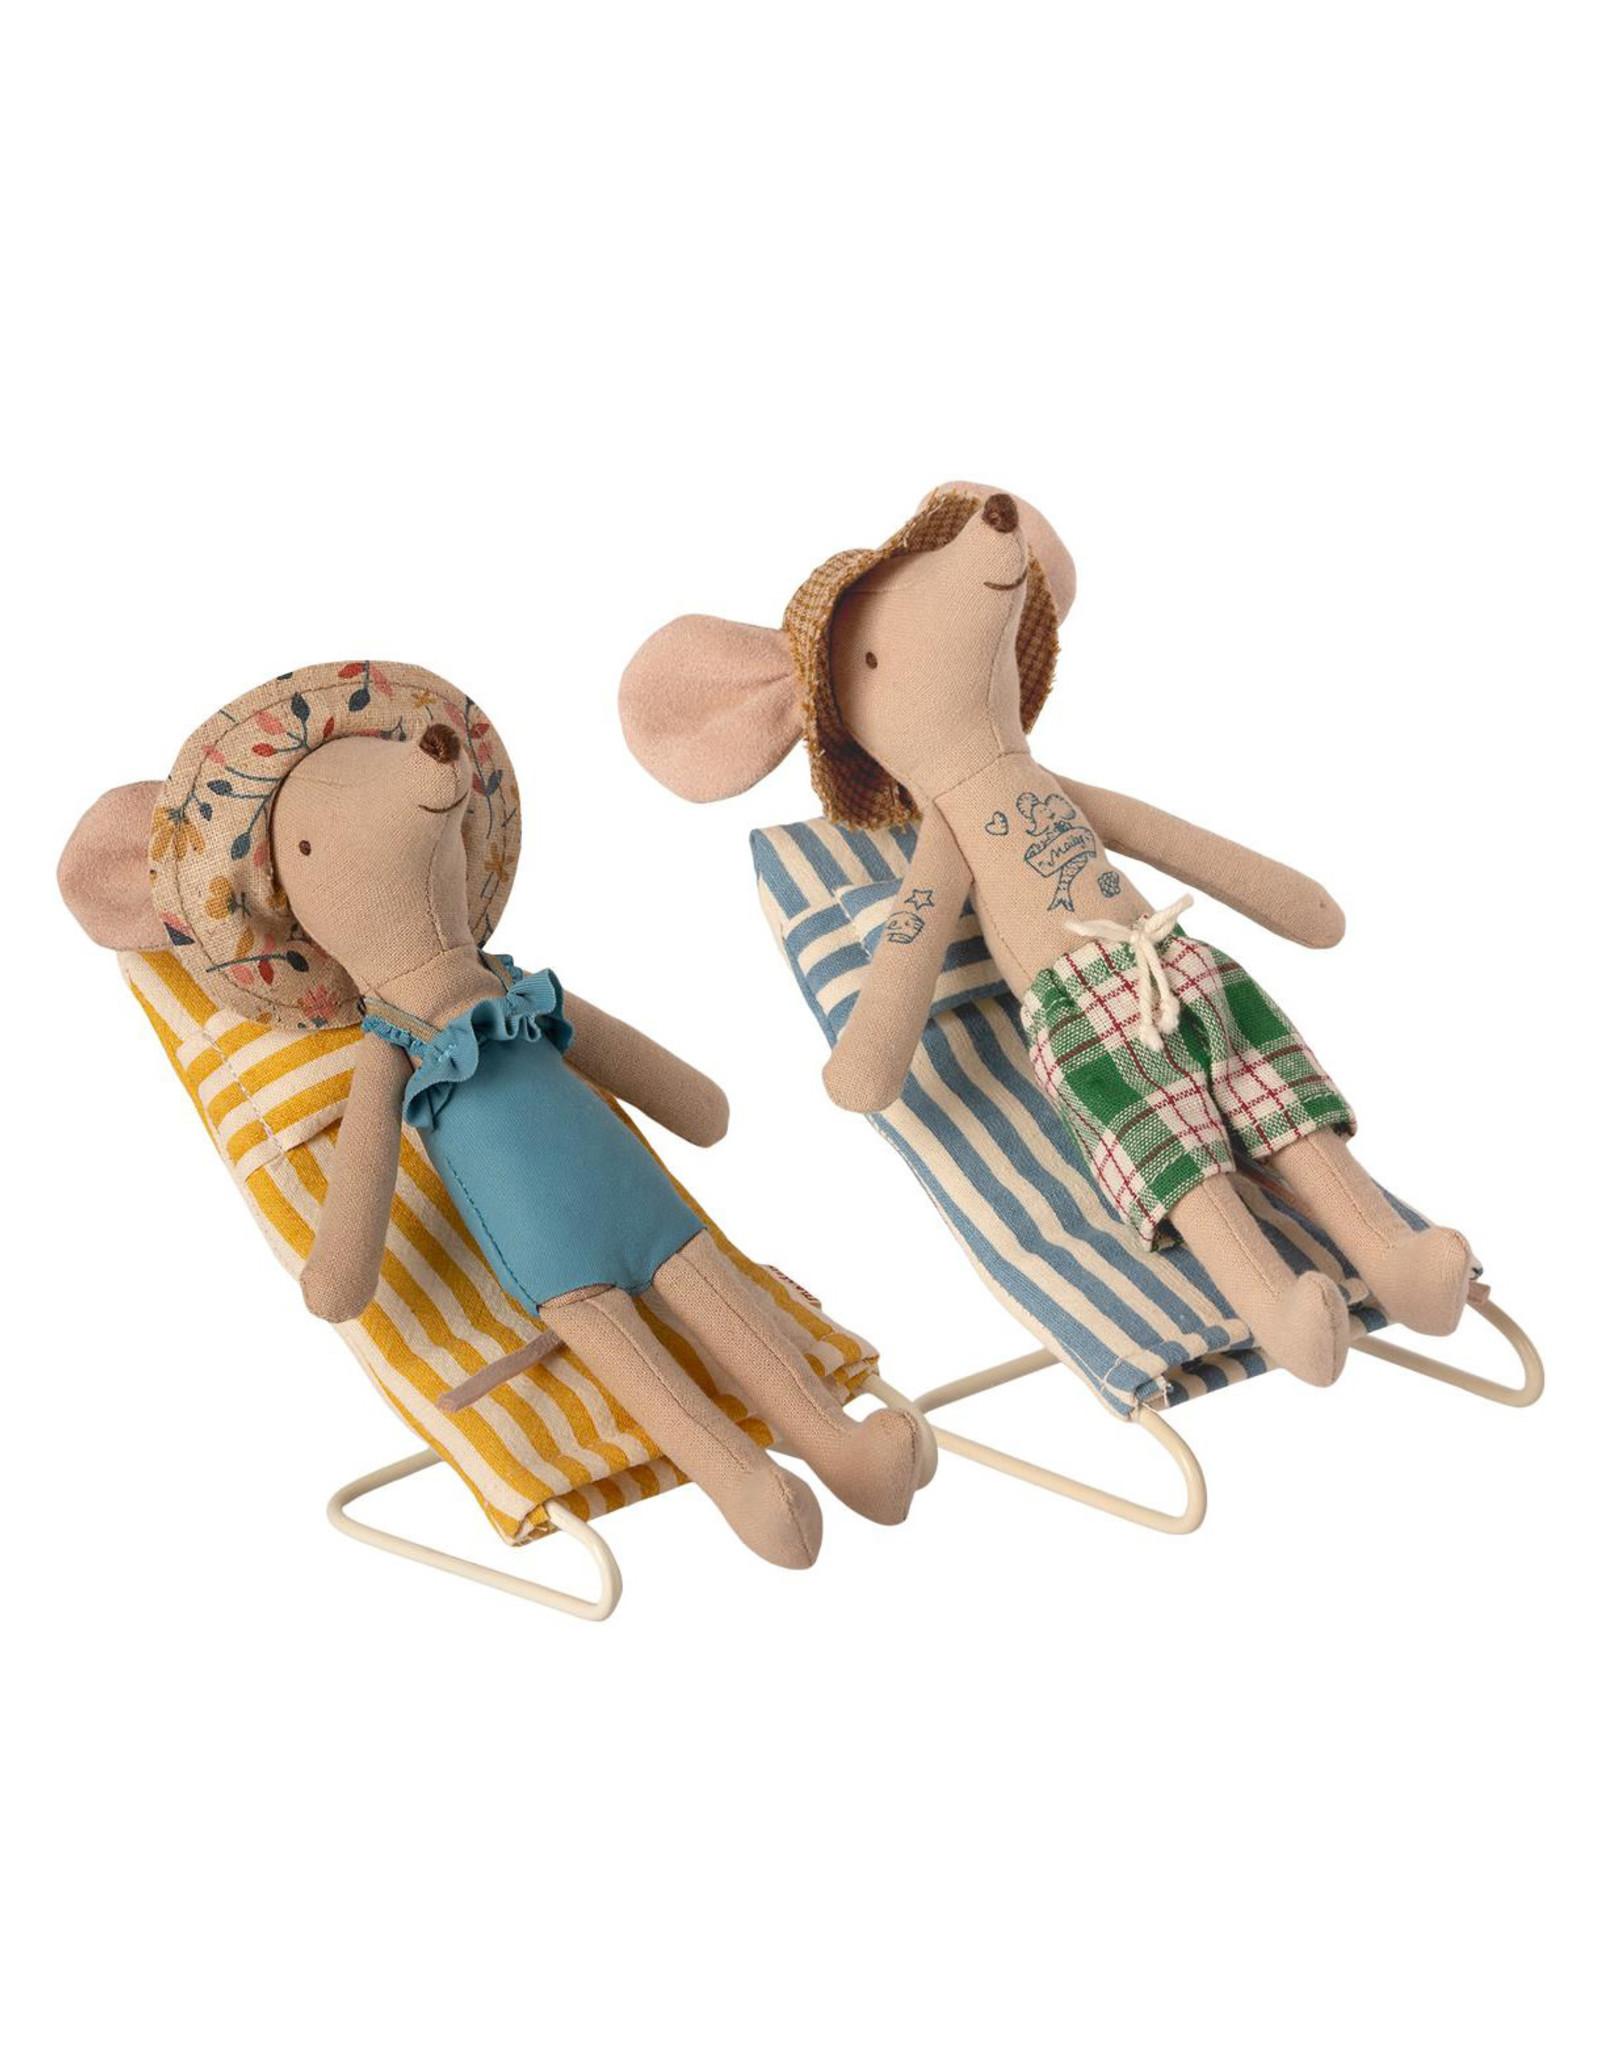 Maileg Mouse Beach Chairs